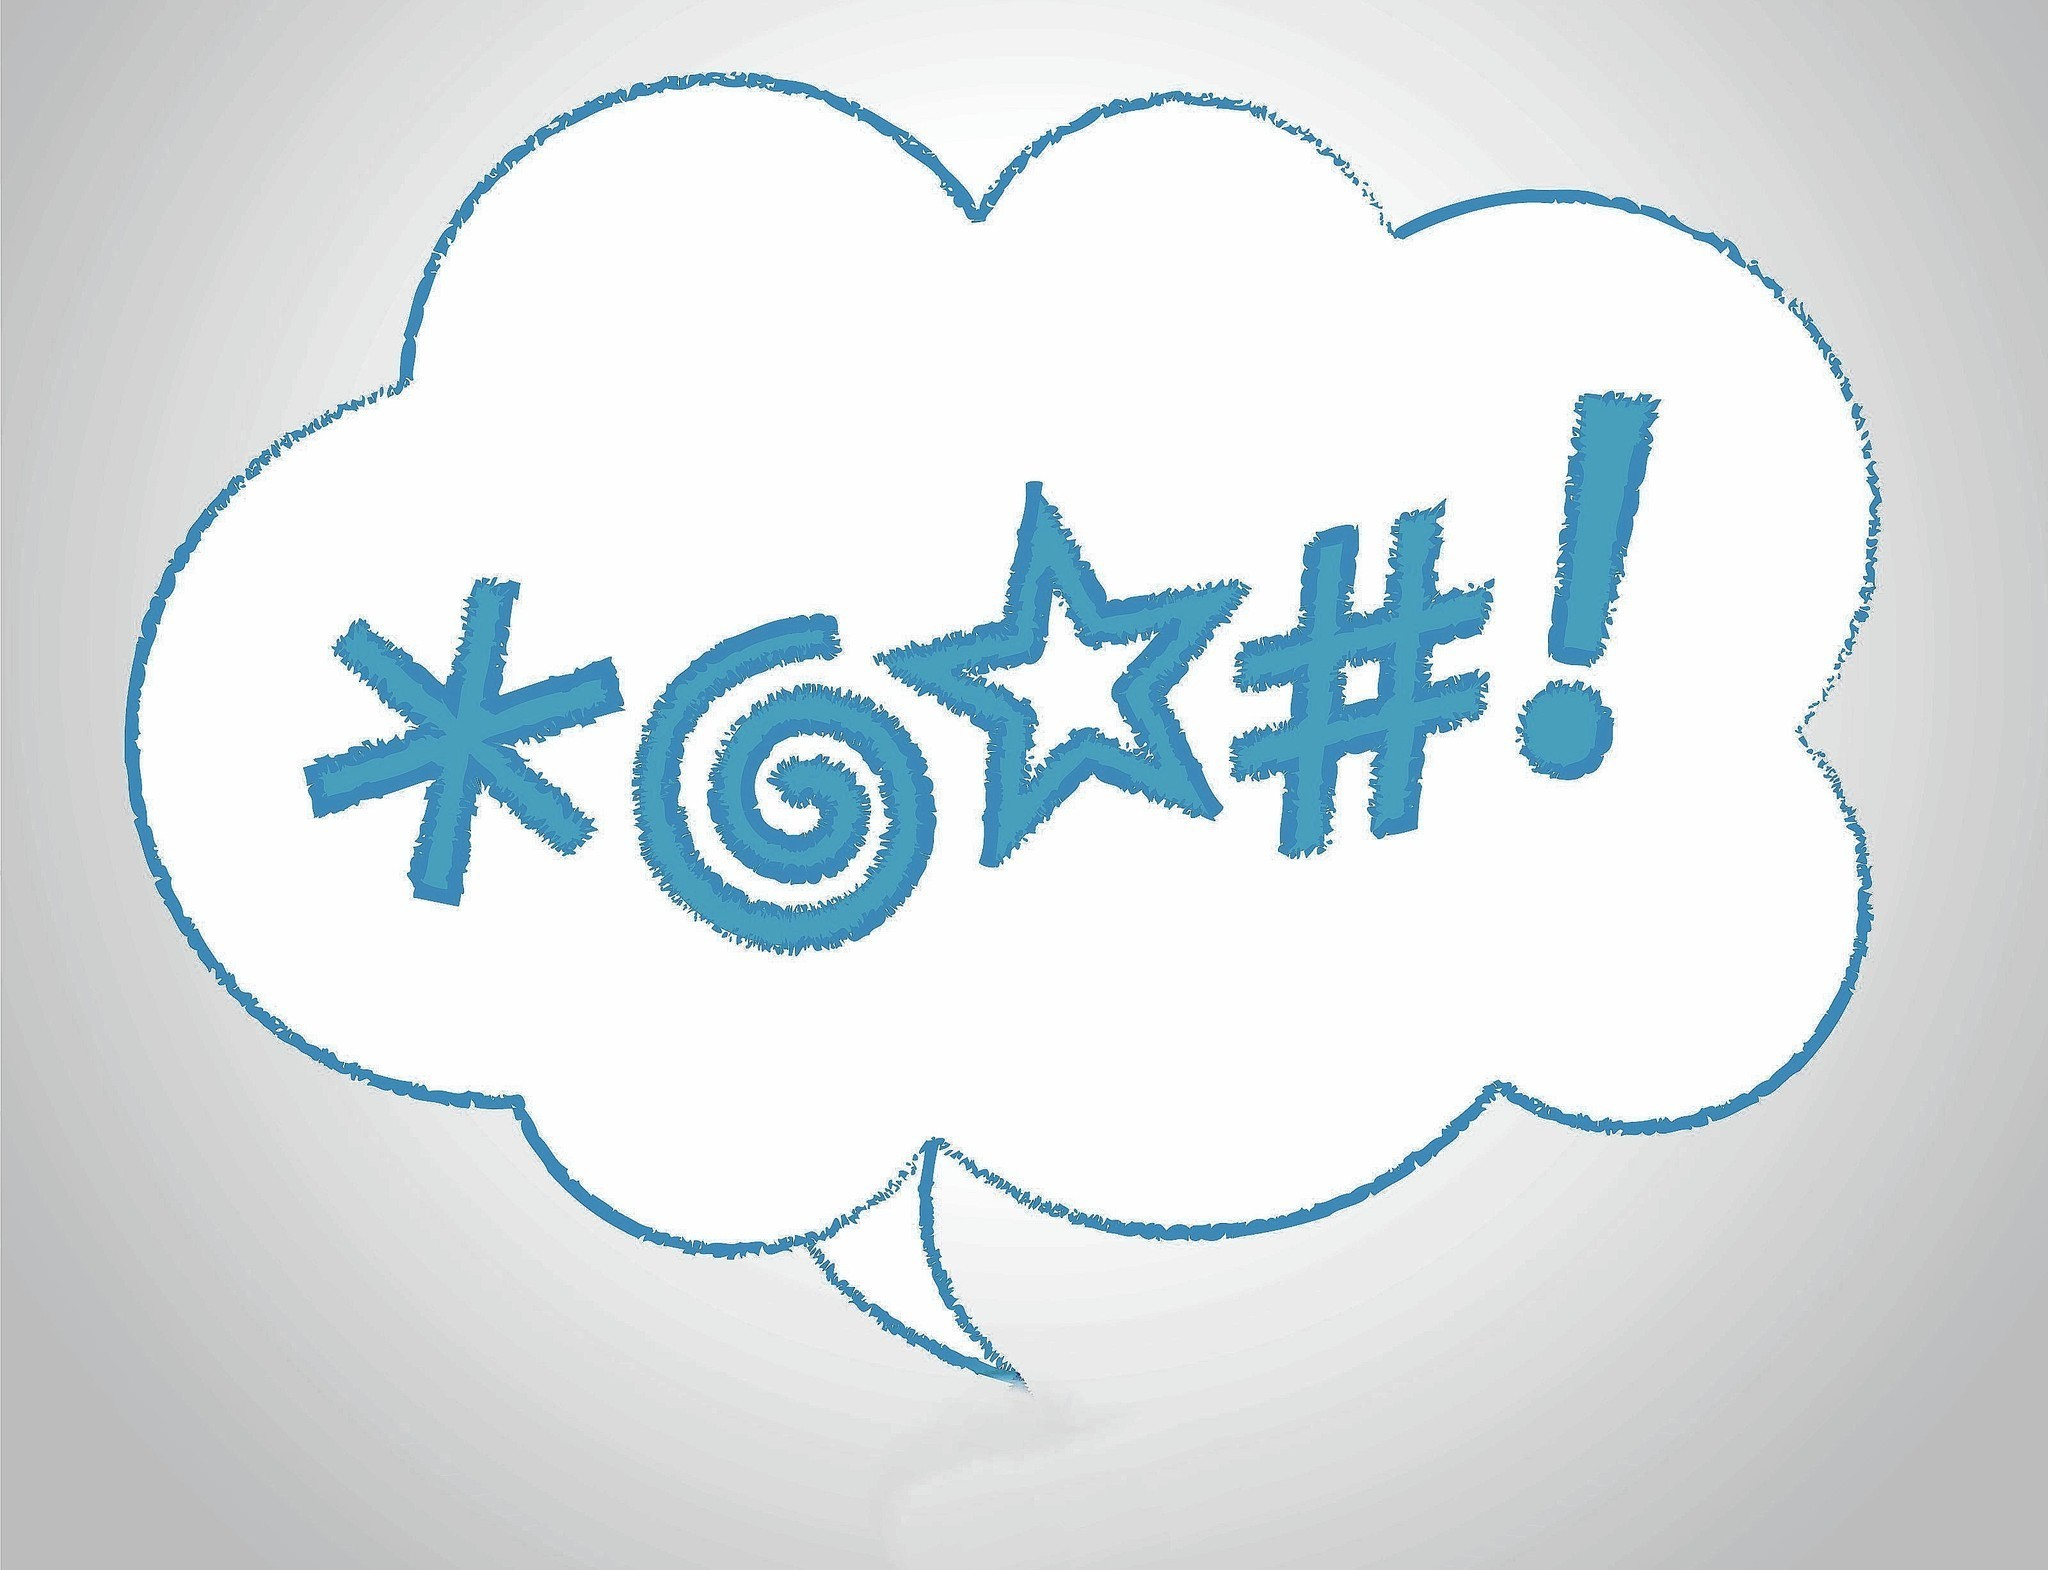 Millennials give no f*cks about swearing at work - redeyechicago.com